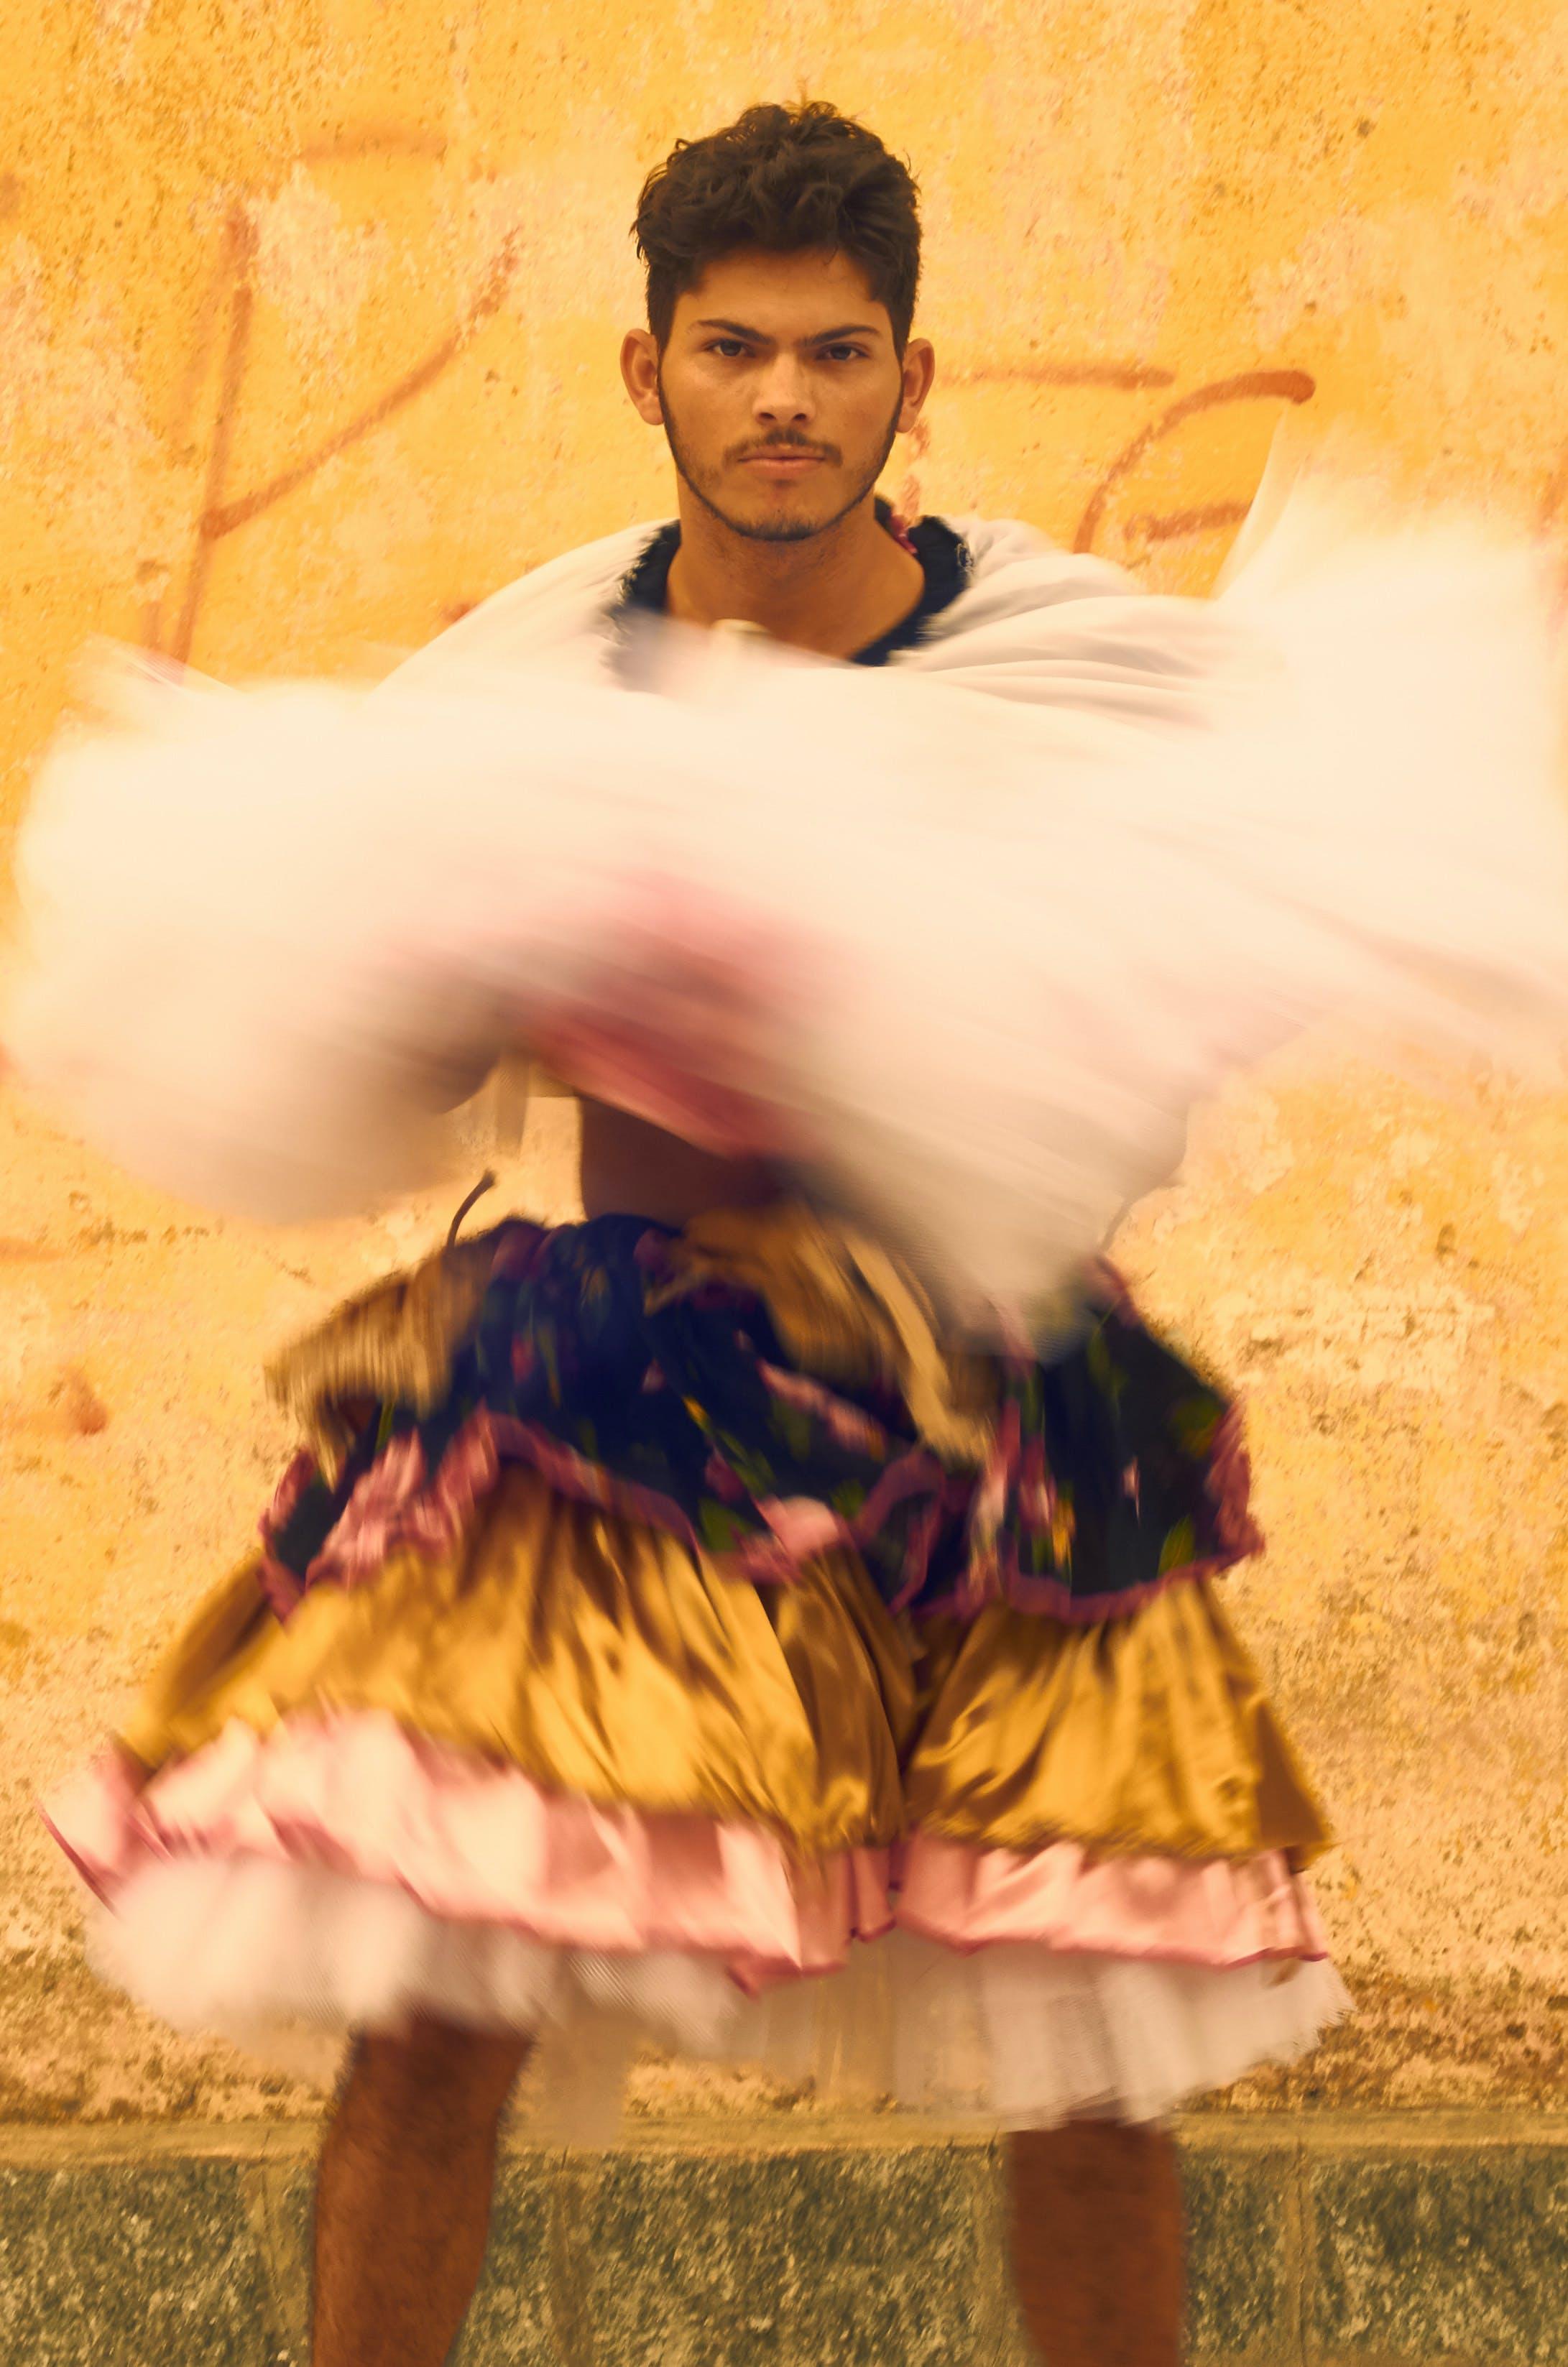 Man Dancing Near Orange Wall